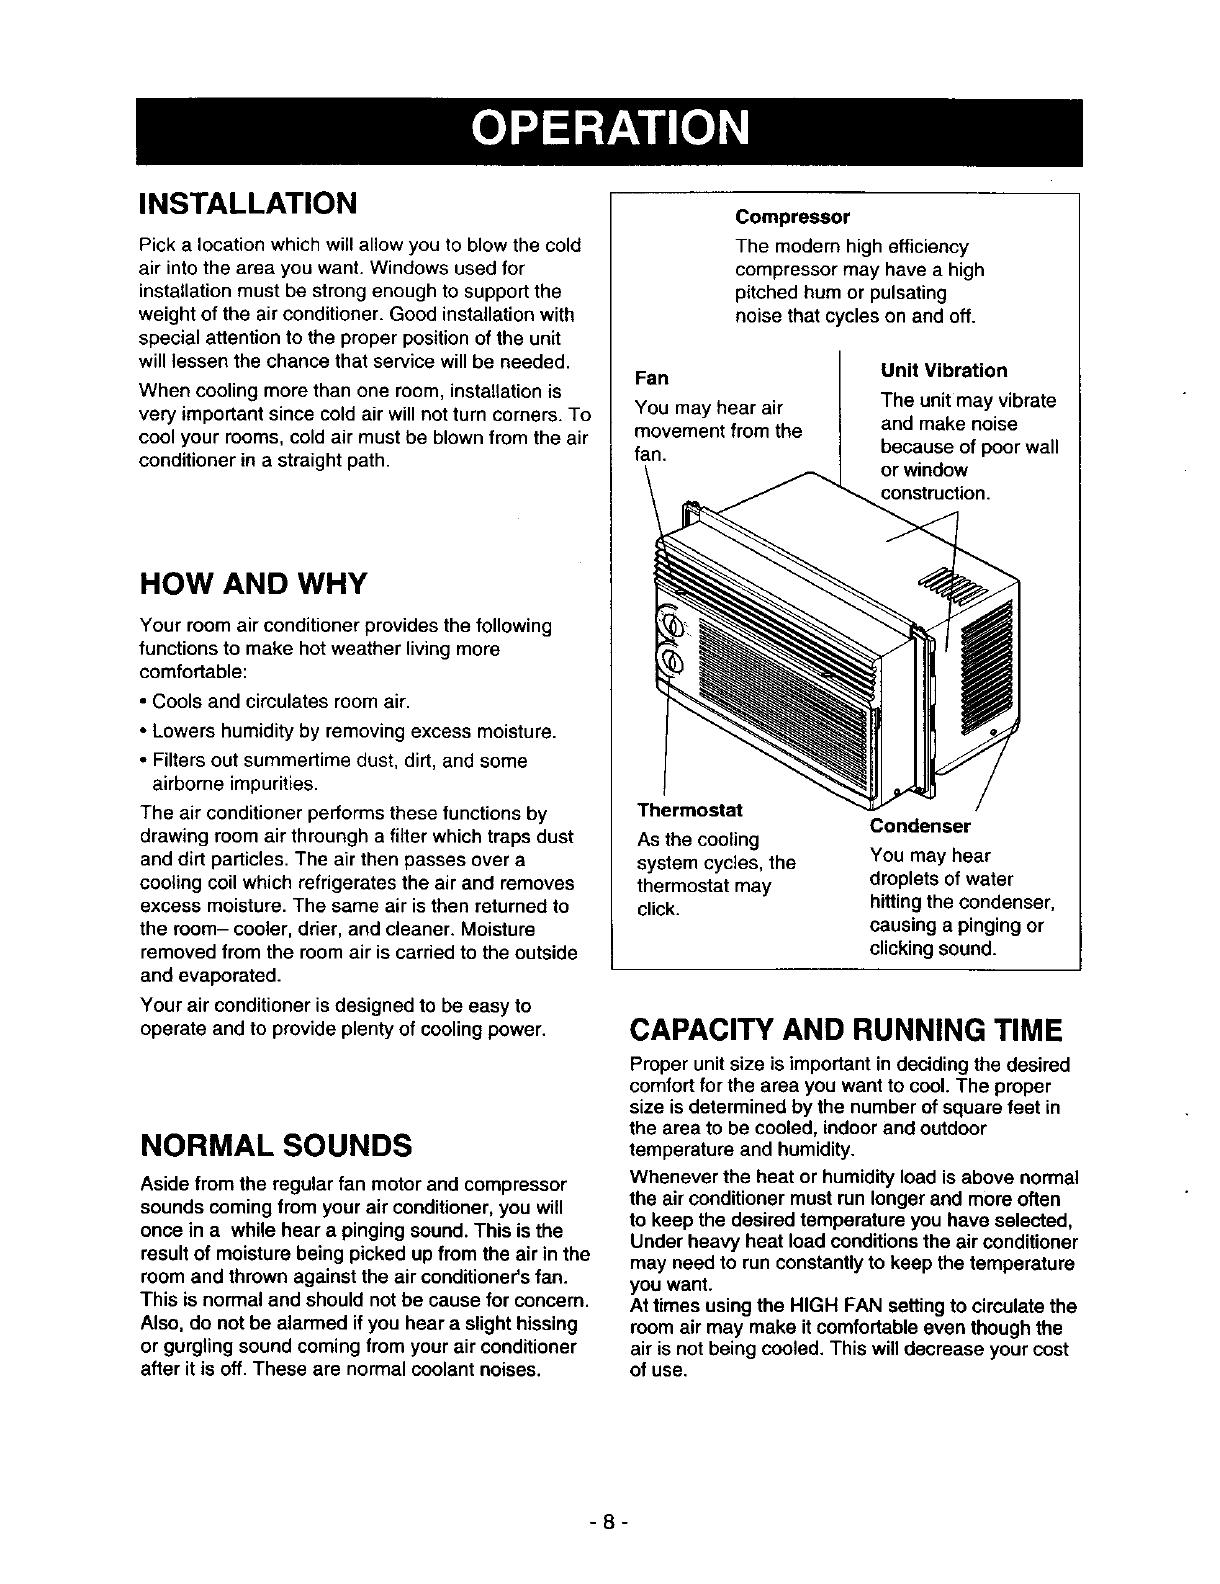 Kenmore 58078053890 User Manual ROOM AIR CONDITIONER Manuals